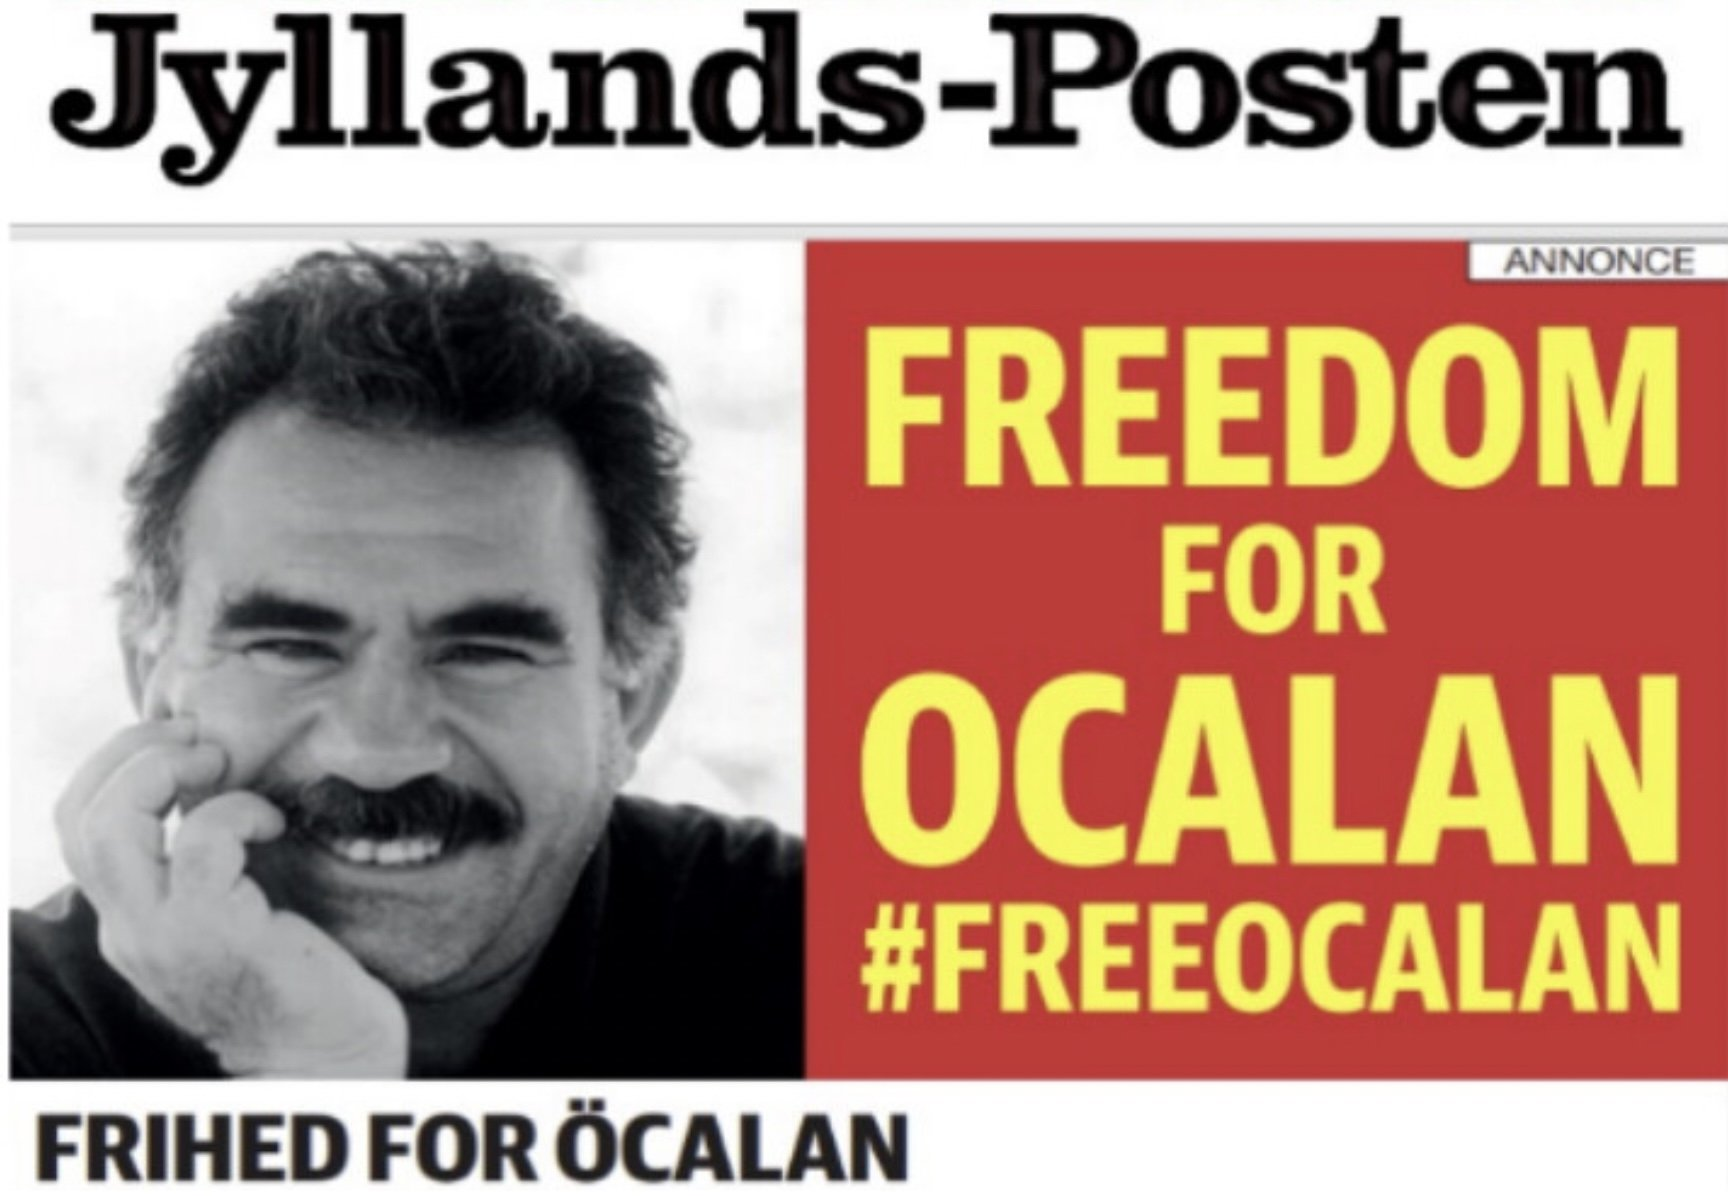 The advertisement calling for the freeing of PKK terrorist ringleader Abdullah Öcalan is seen in this screenshot of the Jyllands-Posten newspaper's digital edition (Credit: Jyllands-Posten)